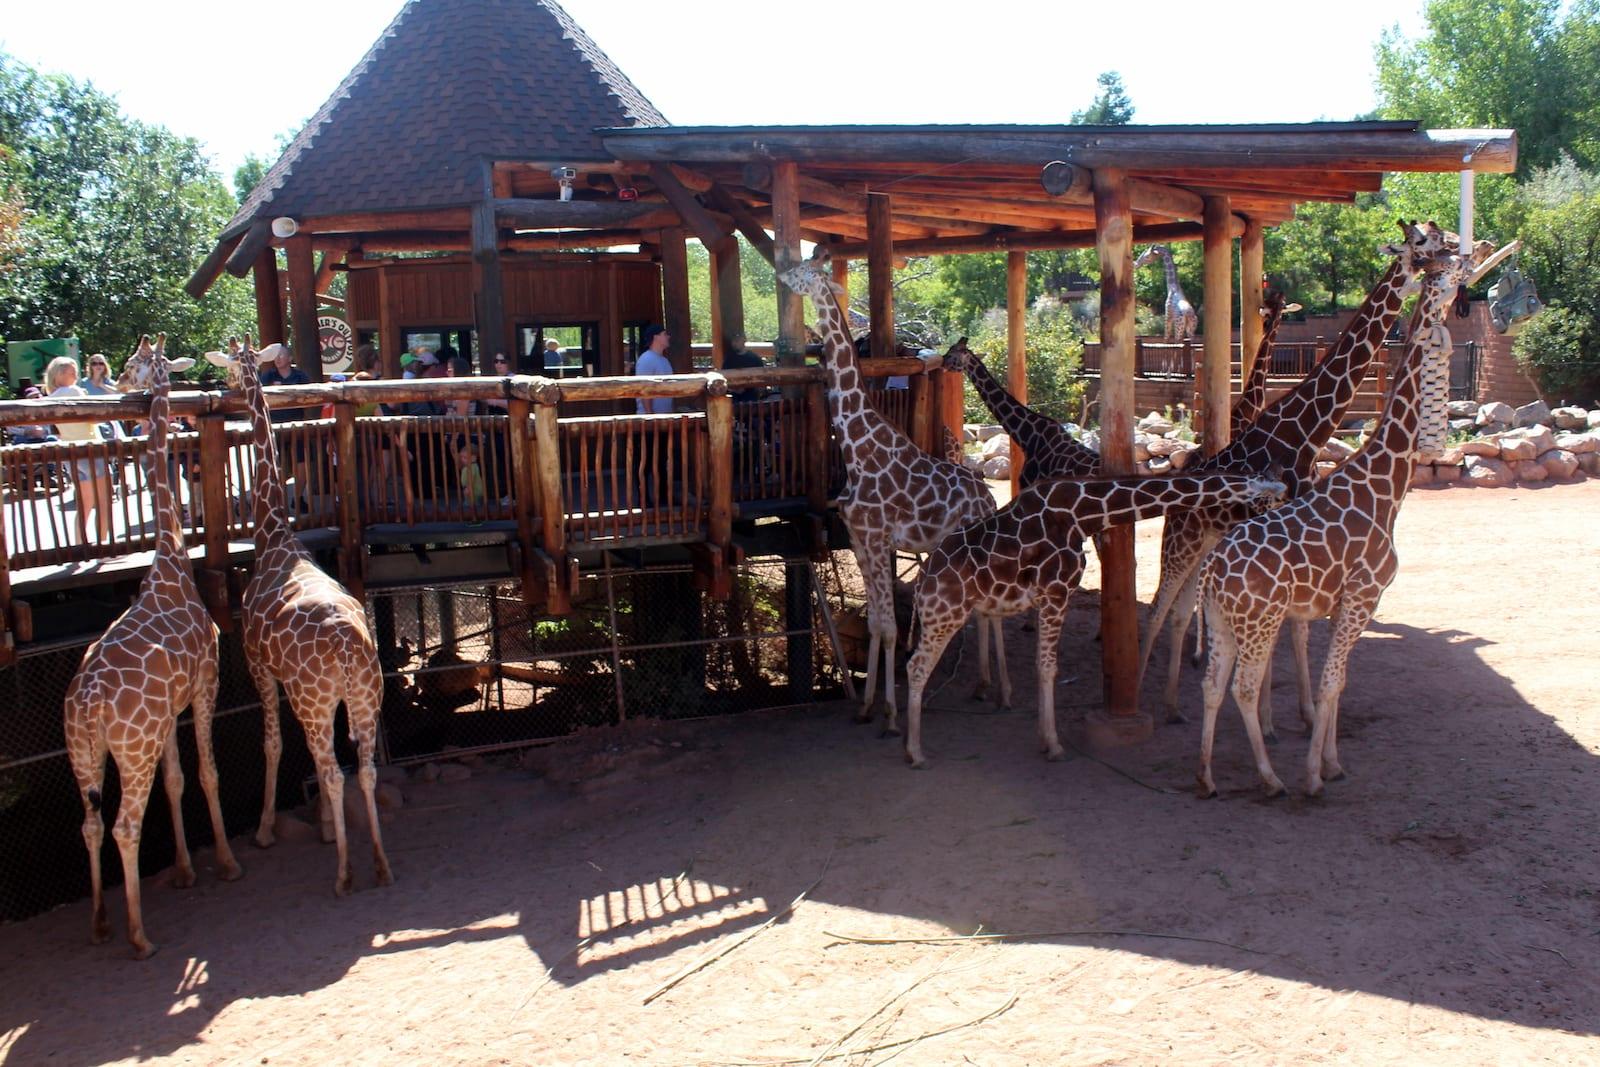 Cheyenne Mountain Zoo, CO